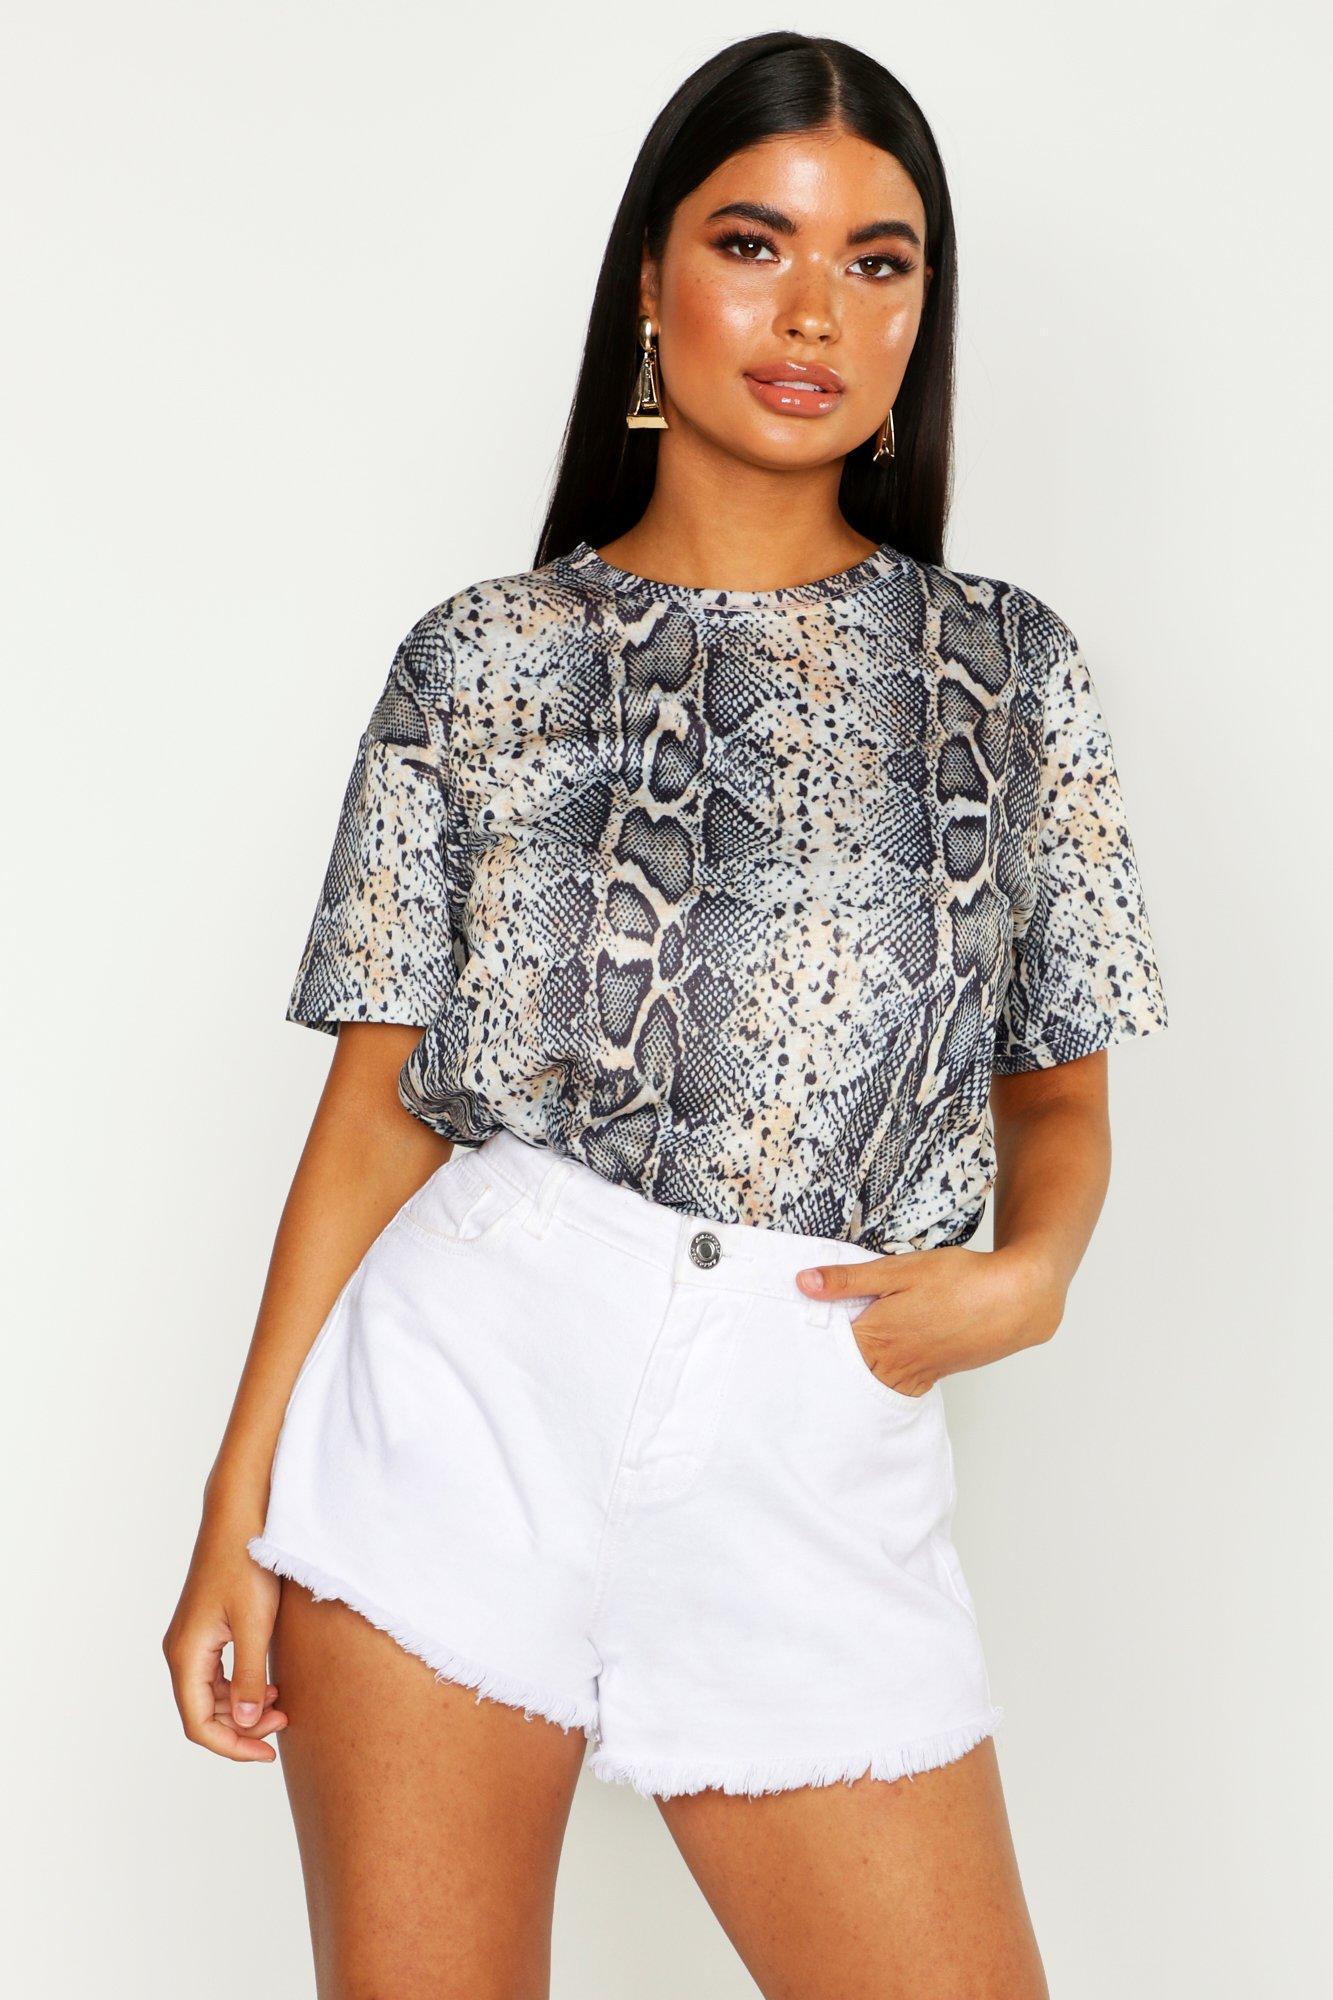 Womens Petite T-Shirt mit abgestimmtem Schlangen-Print - Braun - 30, Braun - Boohoo.com